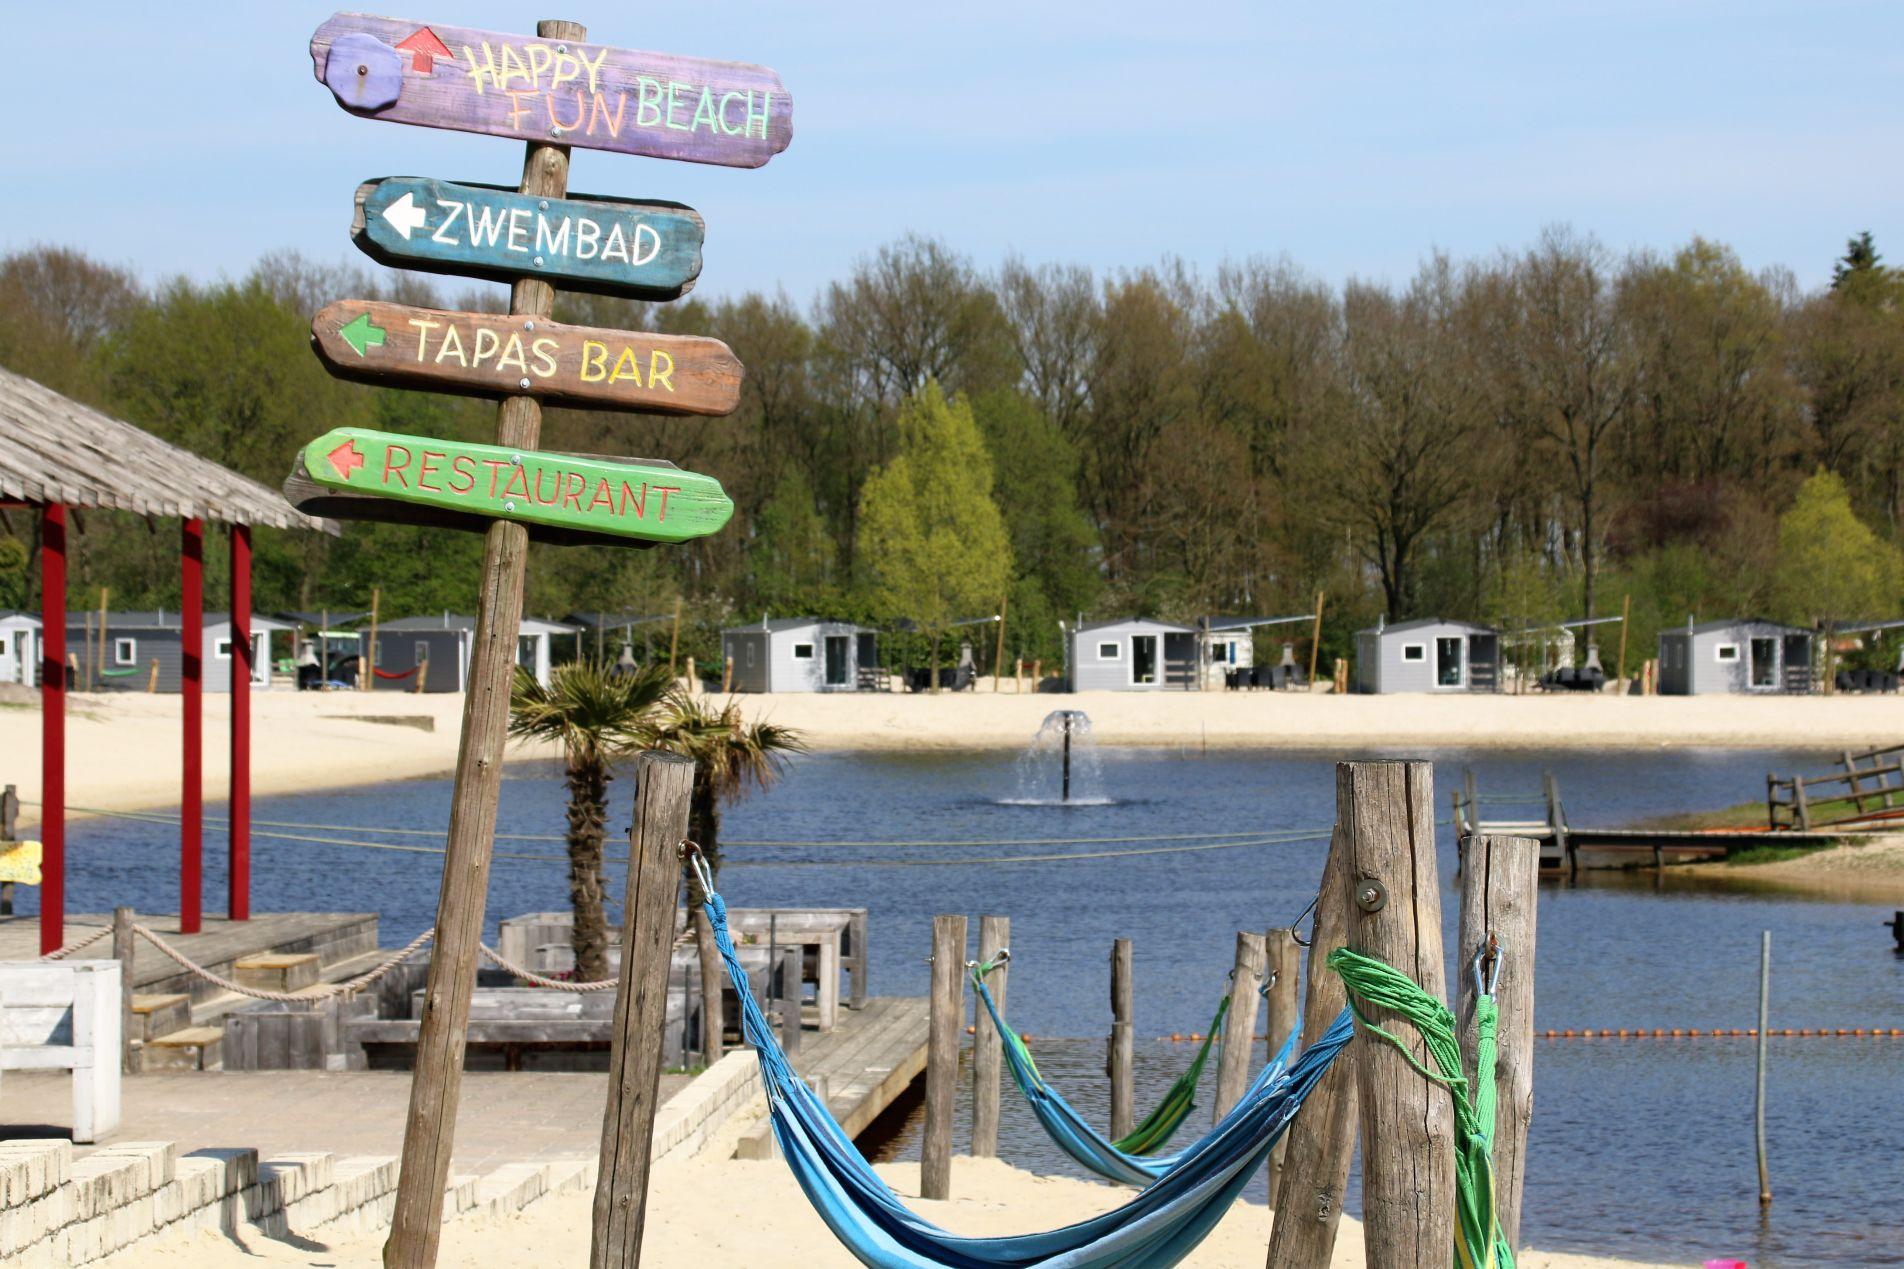 Tienercamping in Nederland met verrassende strandvakantie!